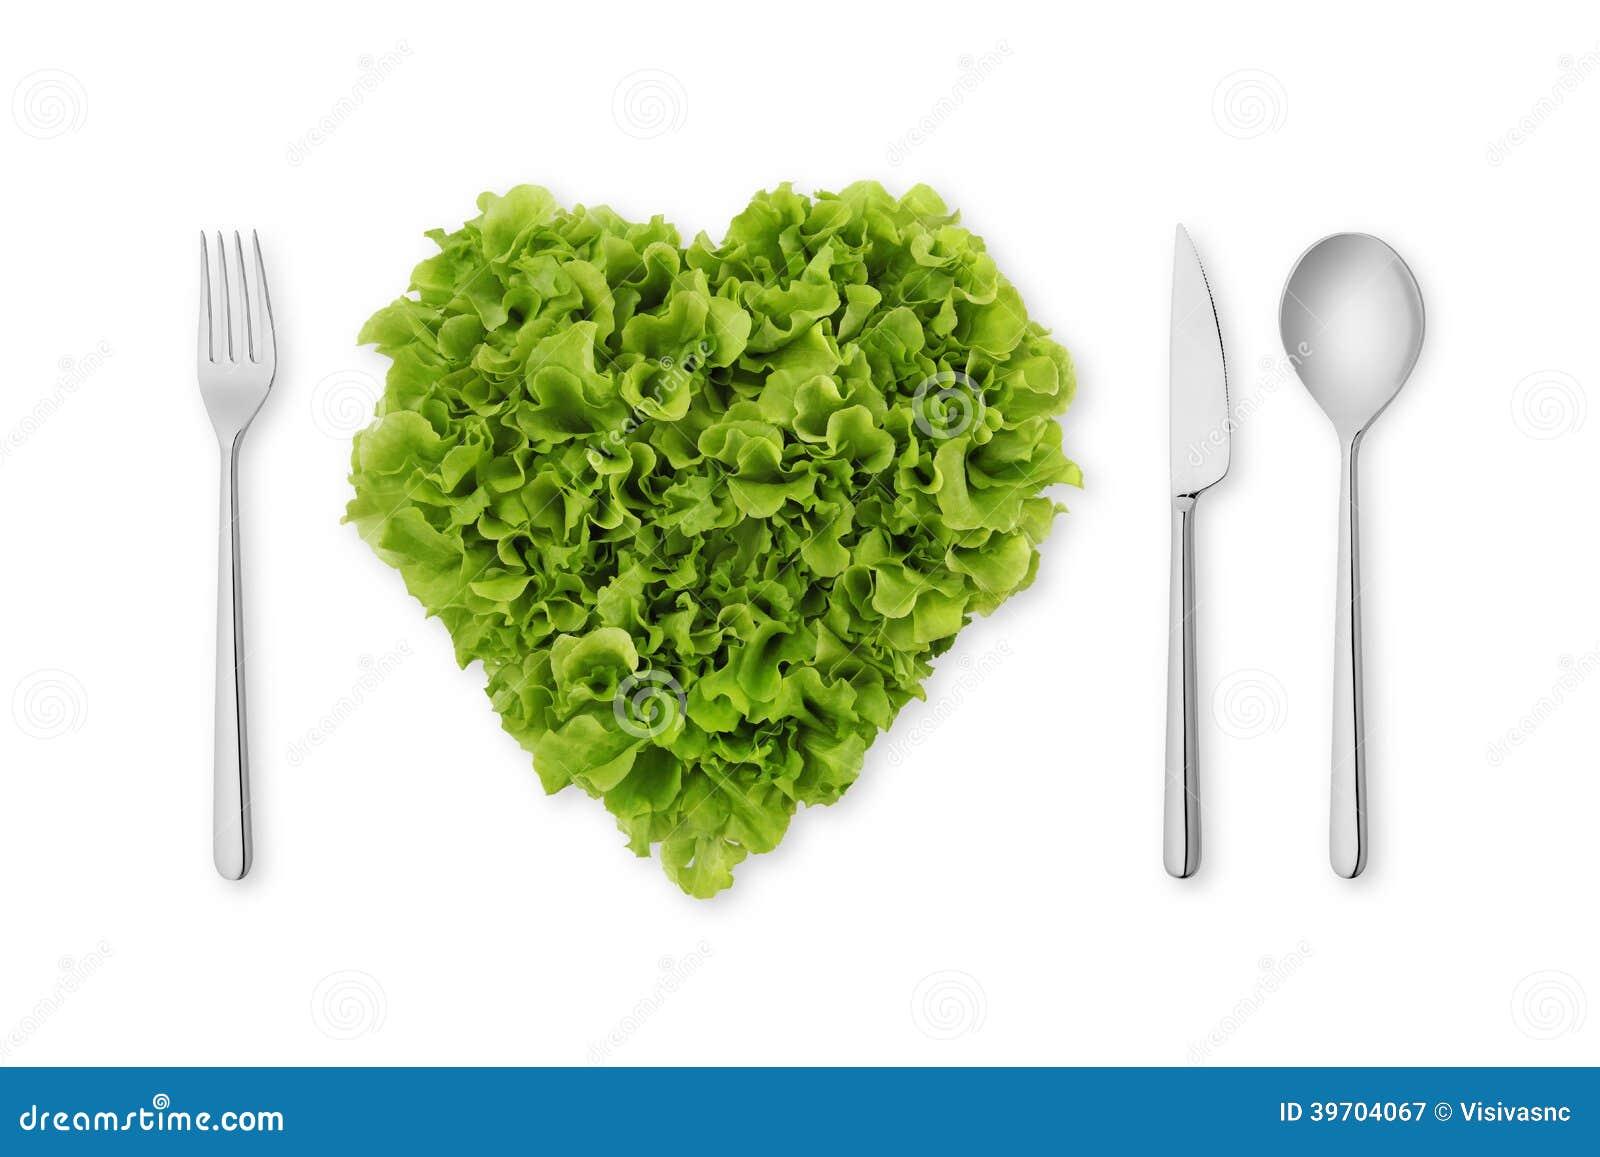 Herz-förmiger Salat, Kopfsalat mit Gabel, Löffel, Messer